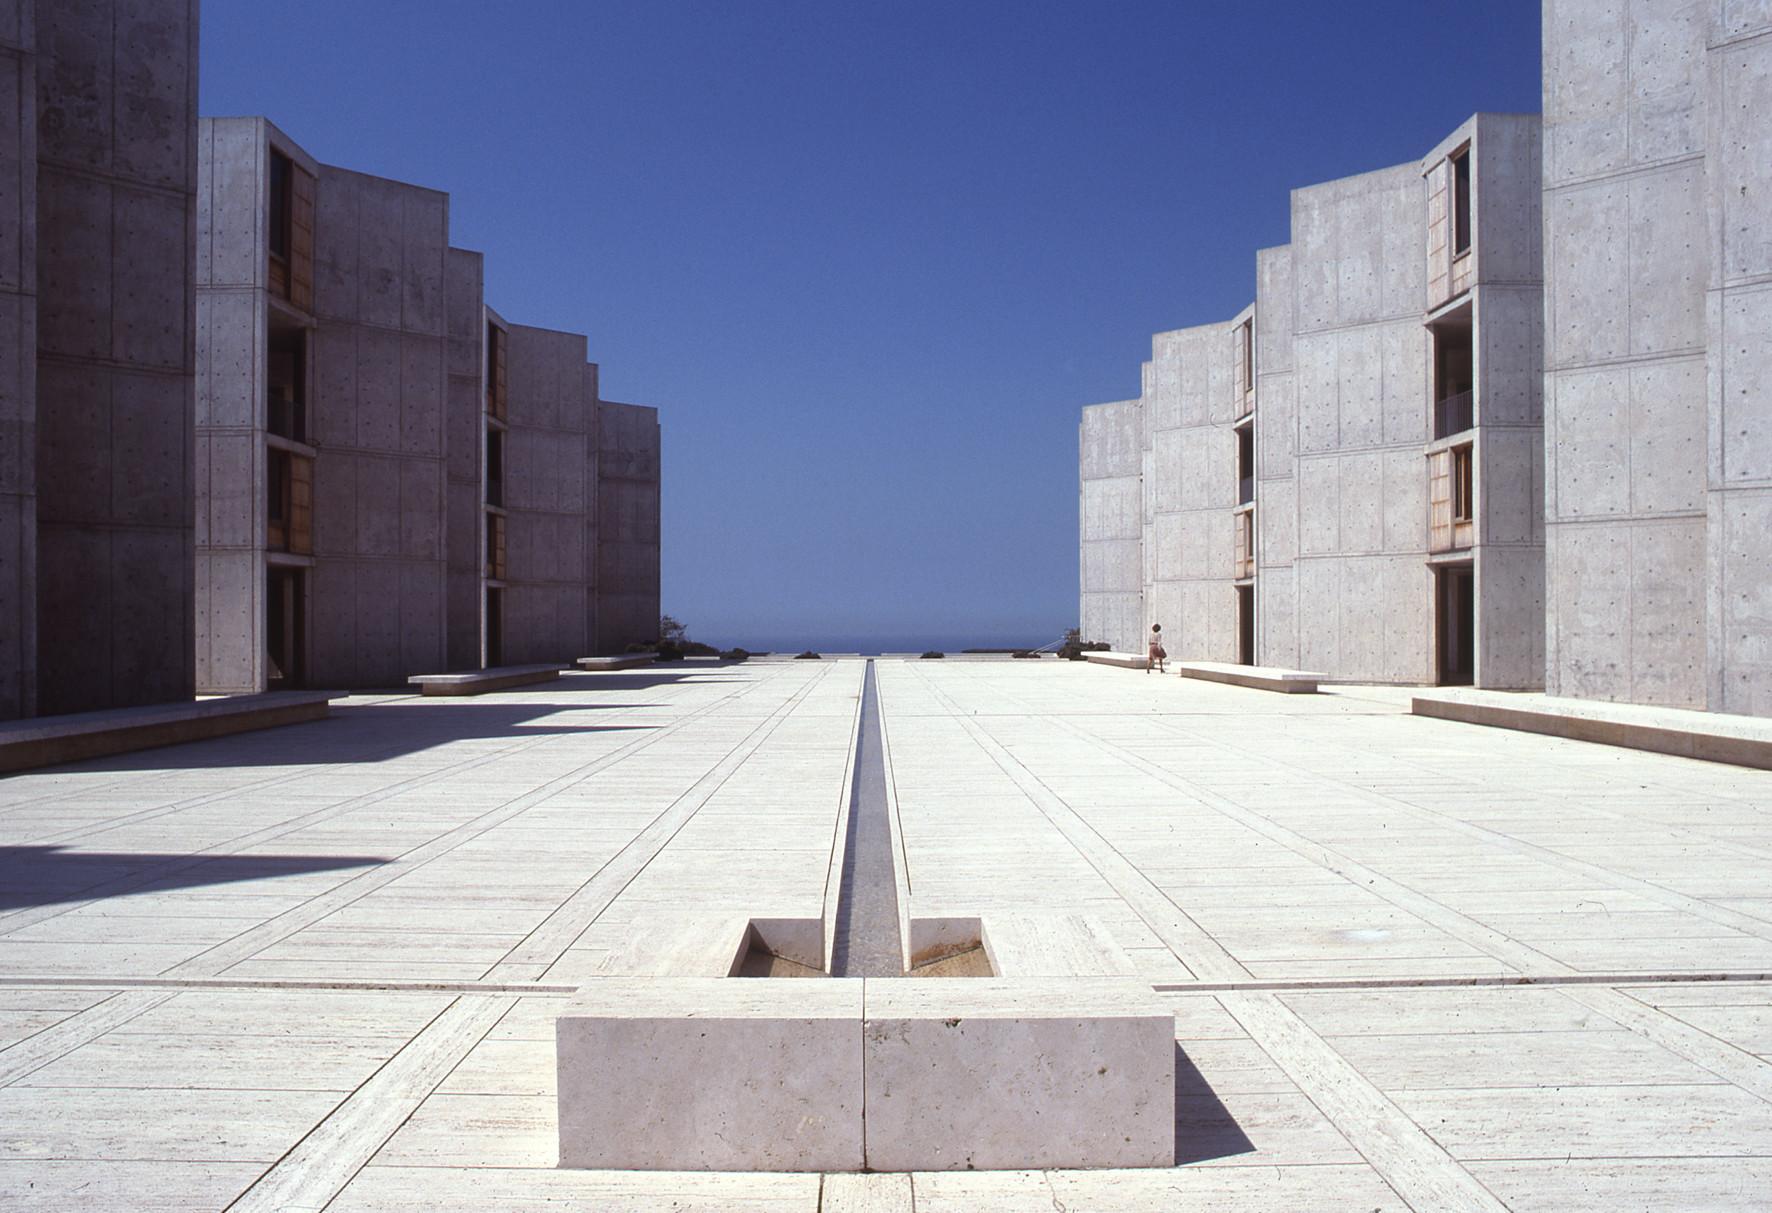 Louis Khan's Salk Institute in La Jolla, Calif.